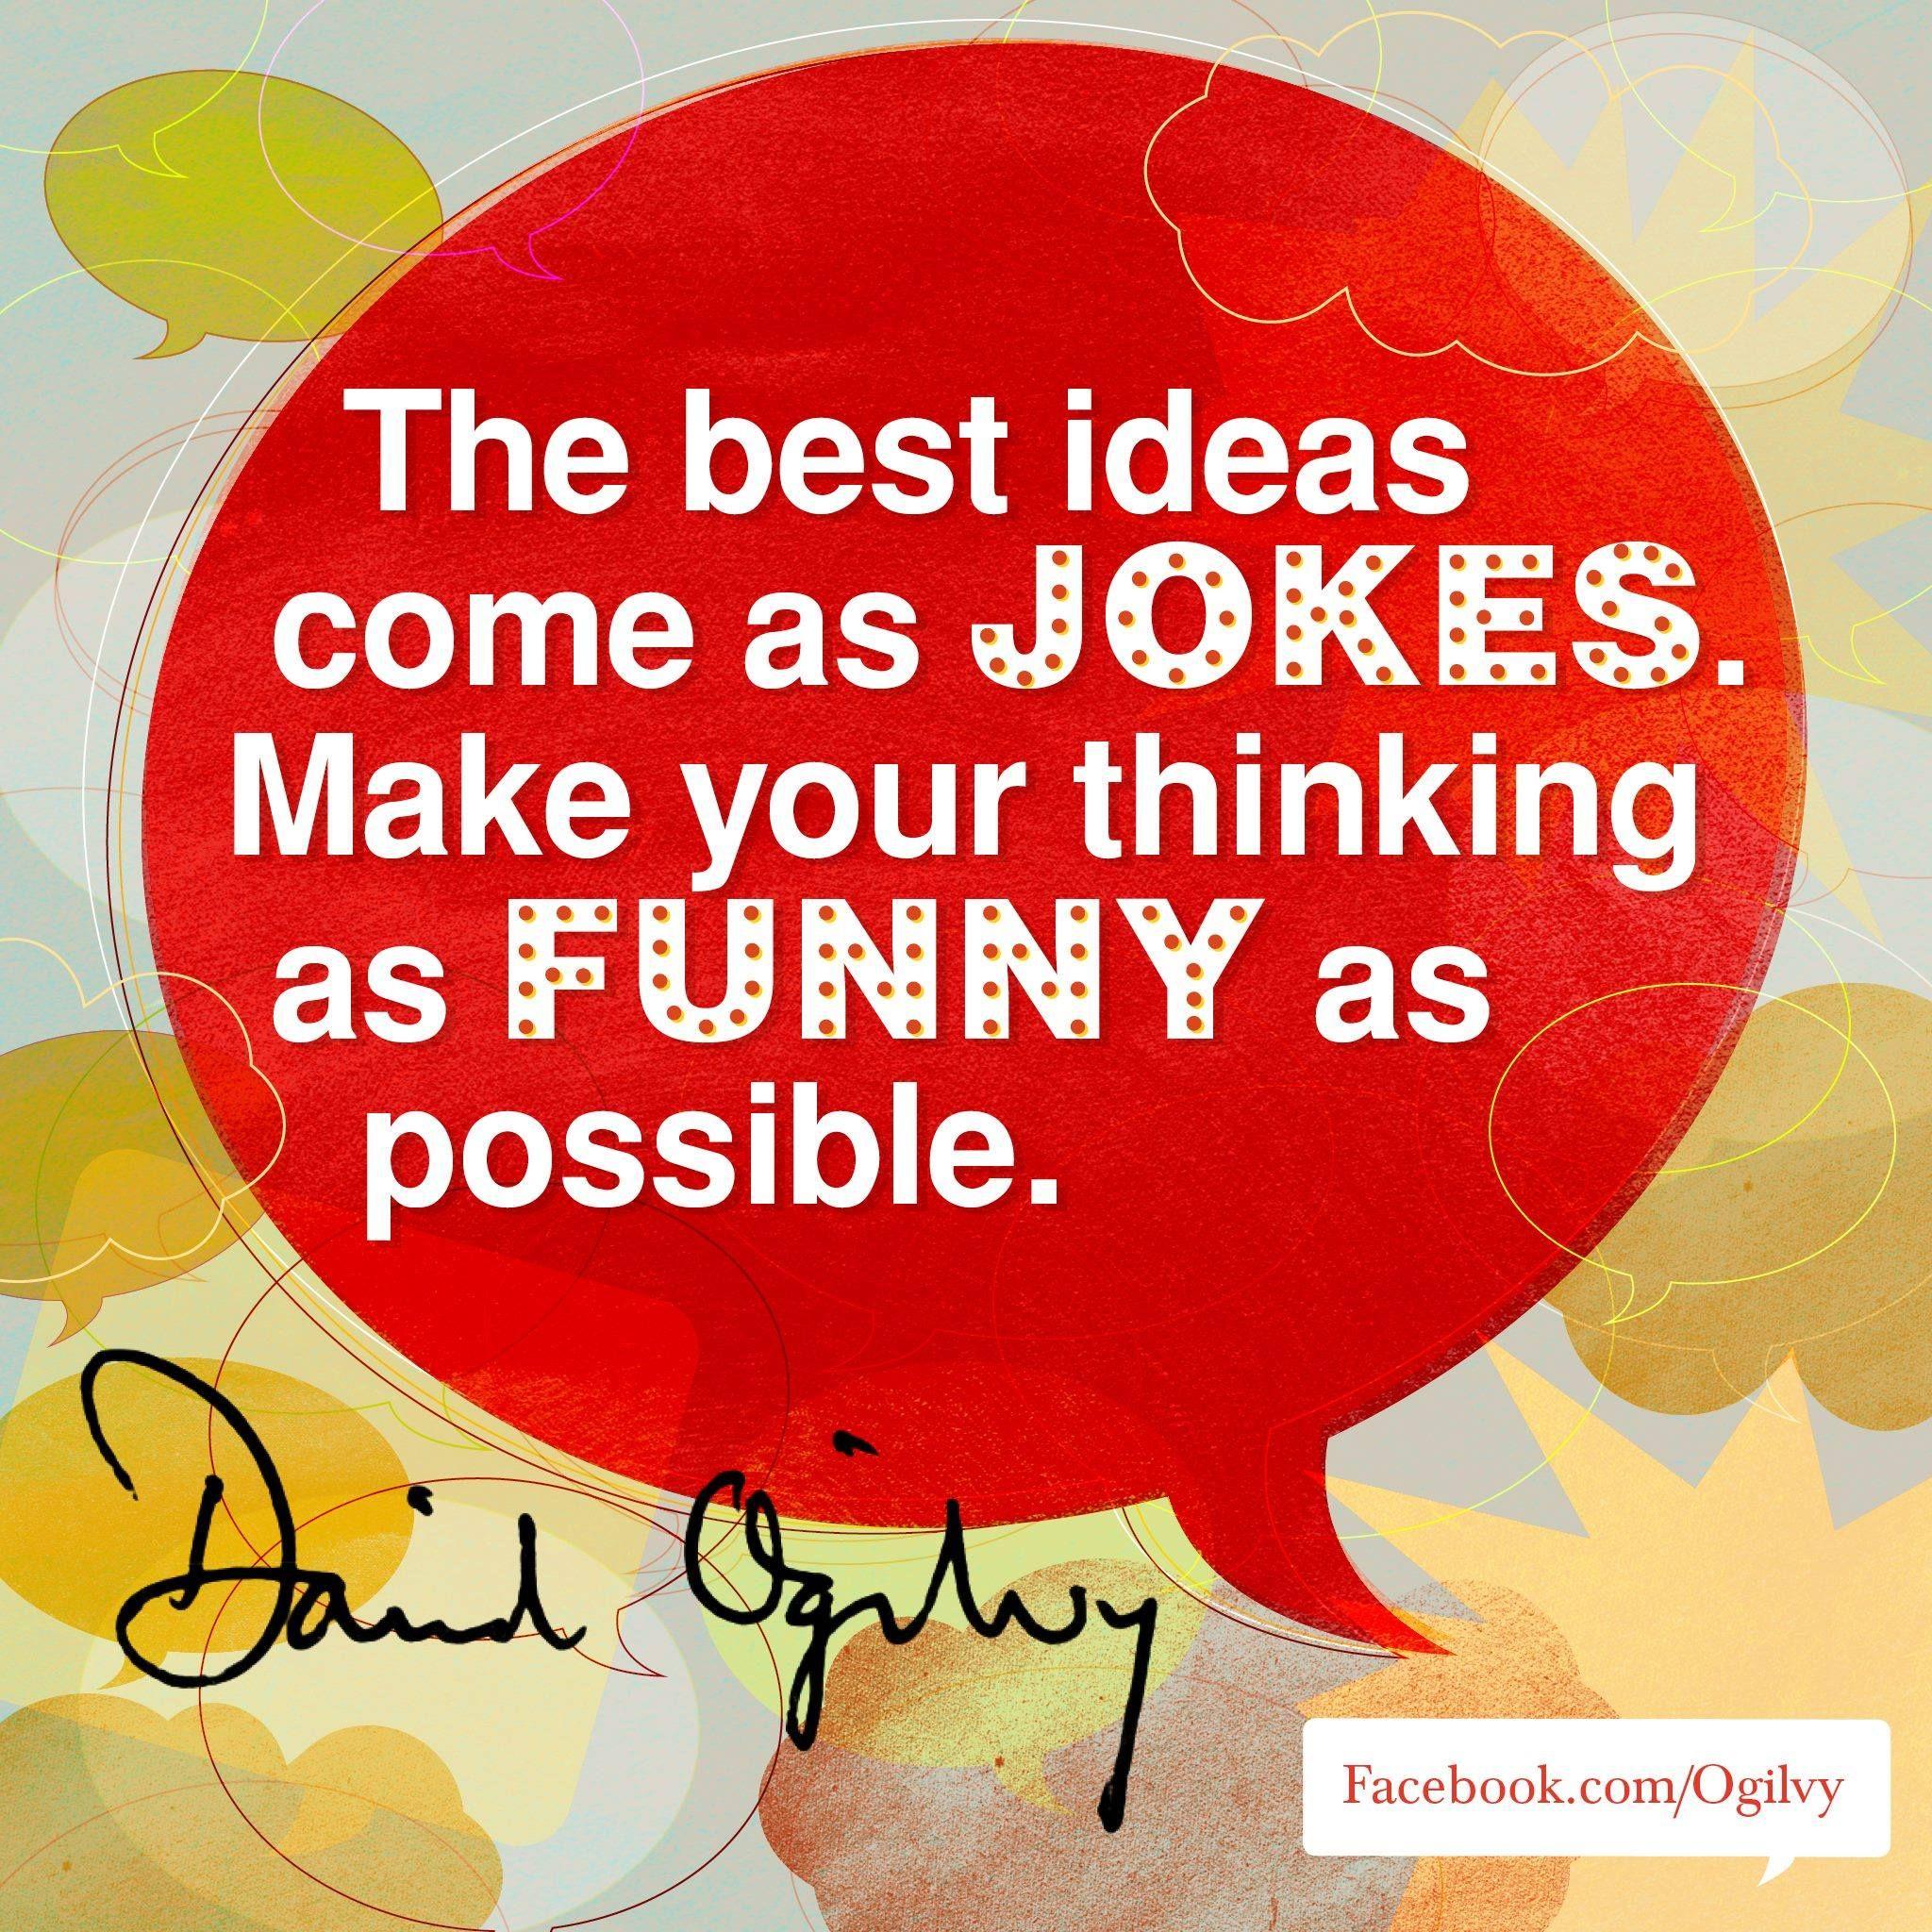 David Ogilvy Quotes Another Tip From David Ogilvy Ogilvy Pr  Ogilvy Inspiration